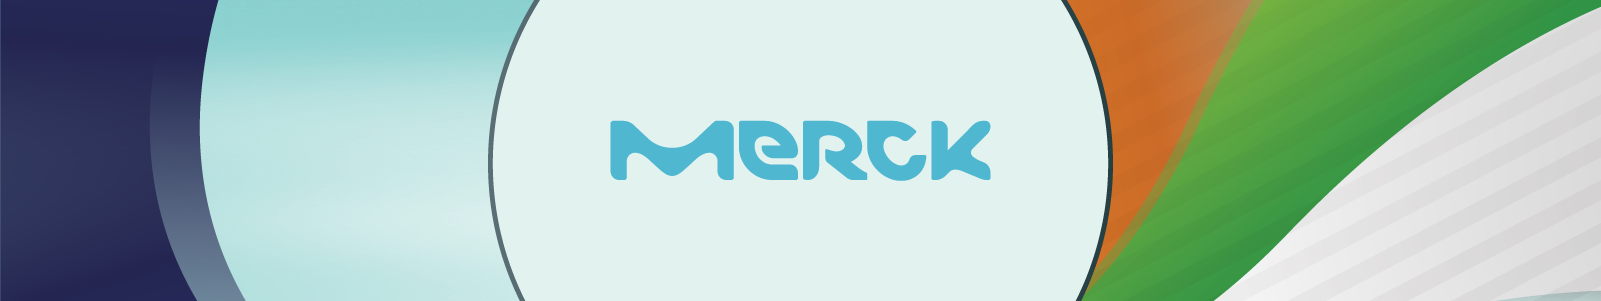 ETED2021-banner-merck